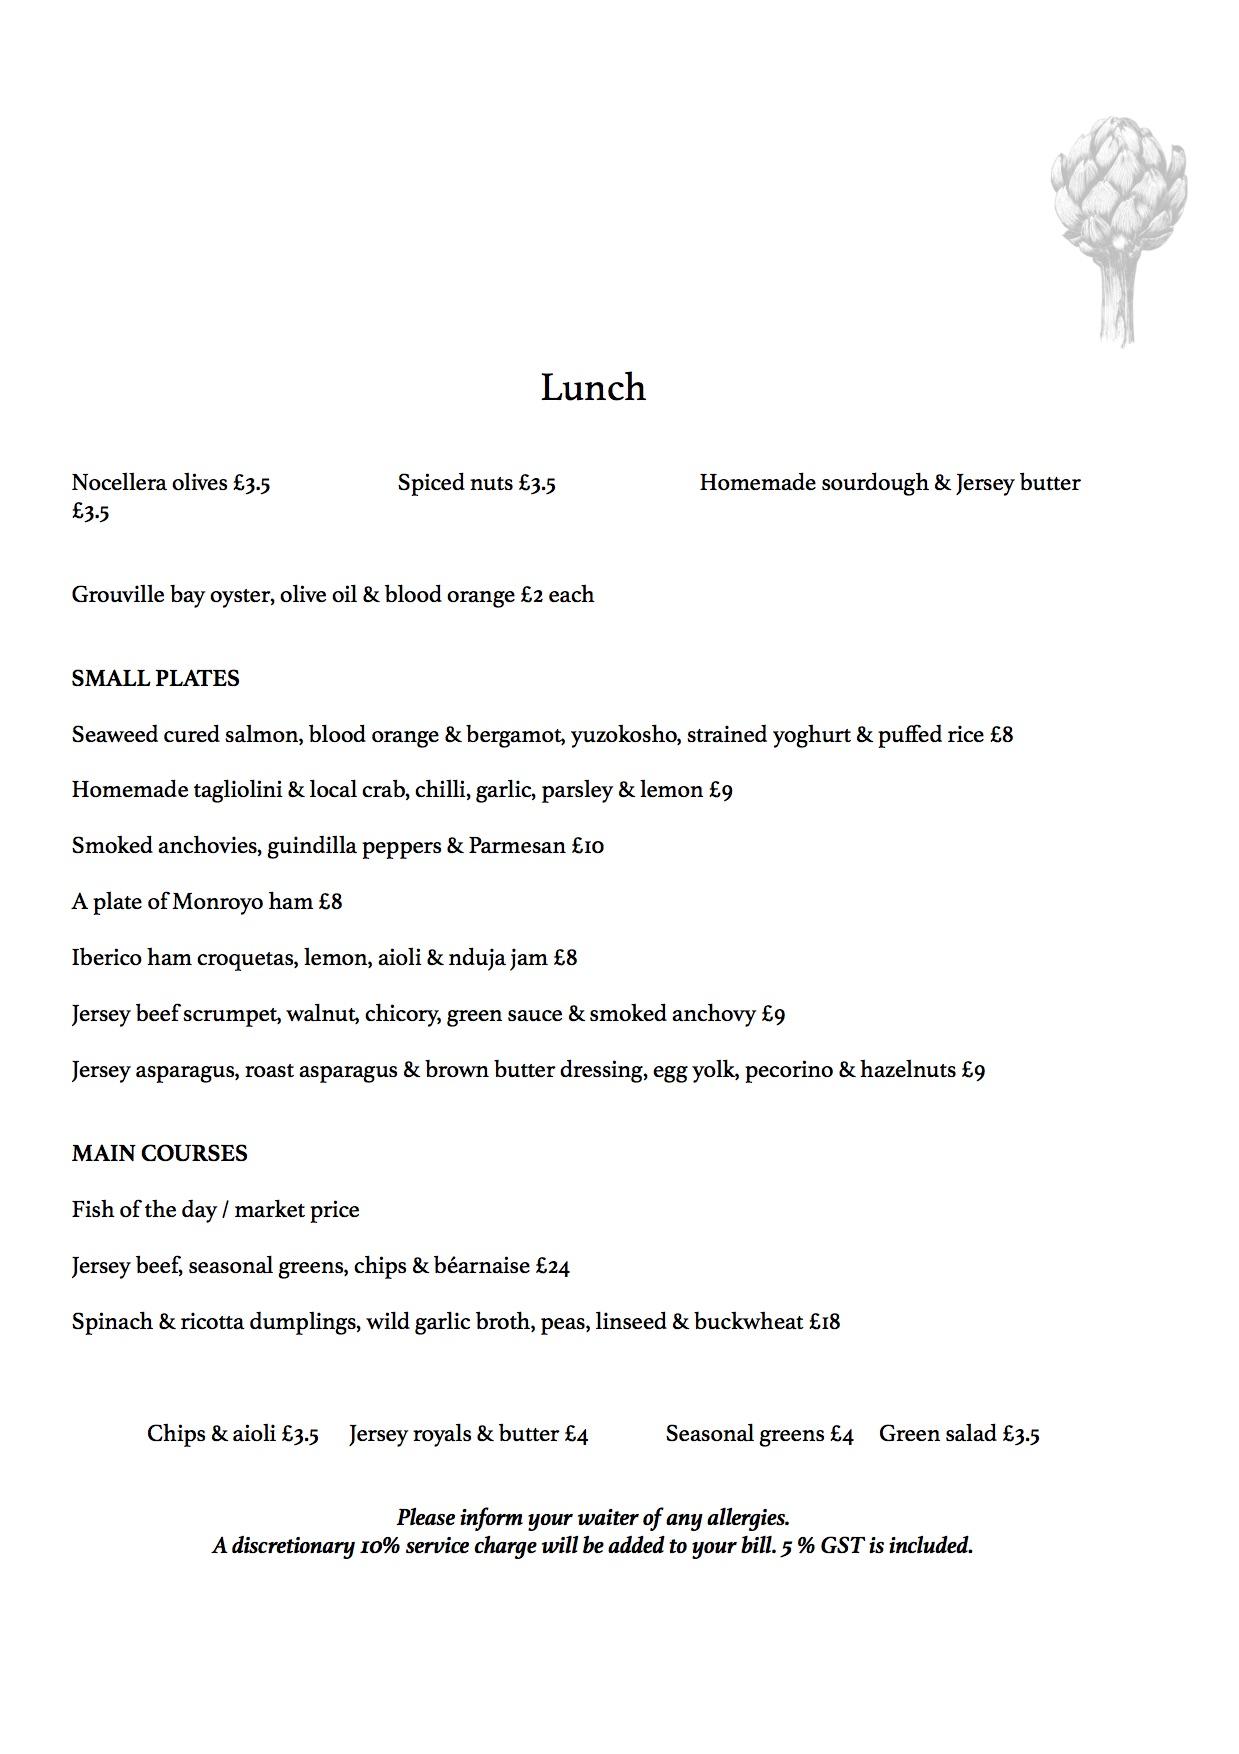 Lunch website.jpg